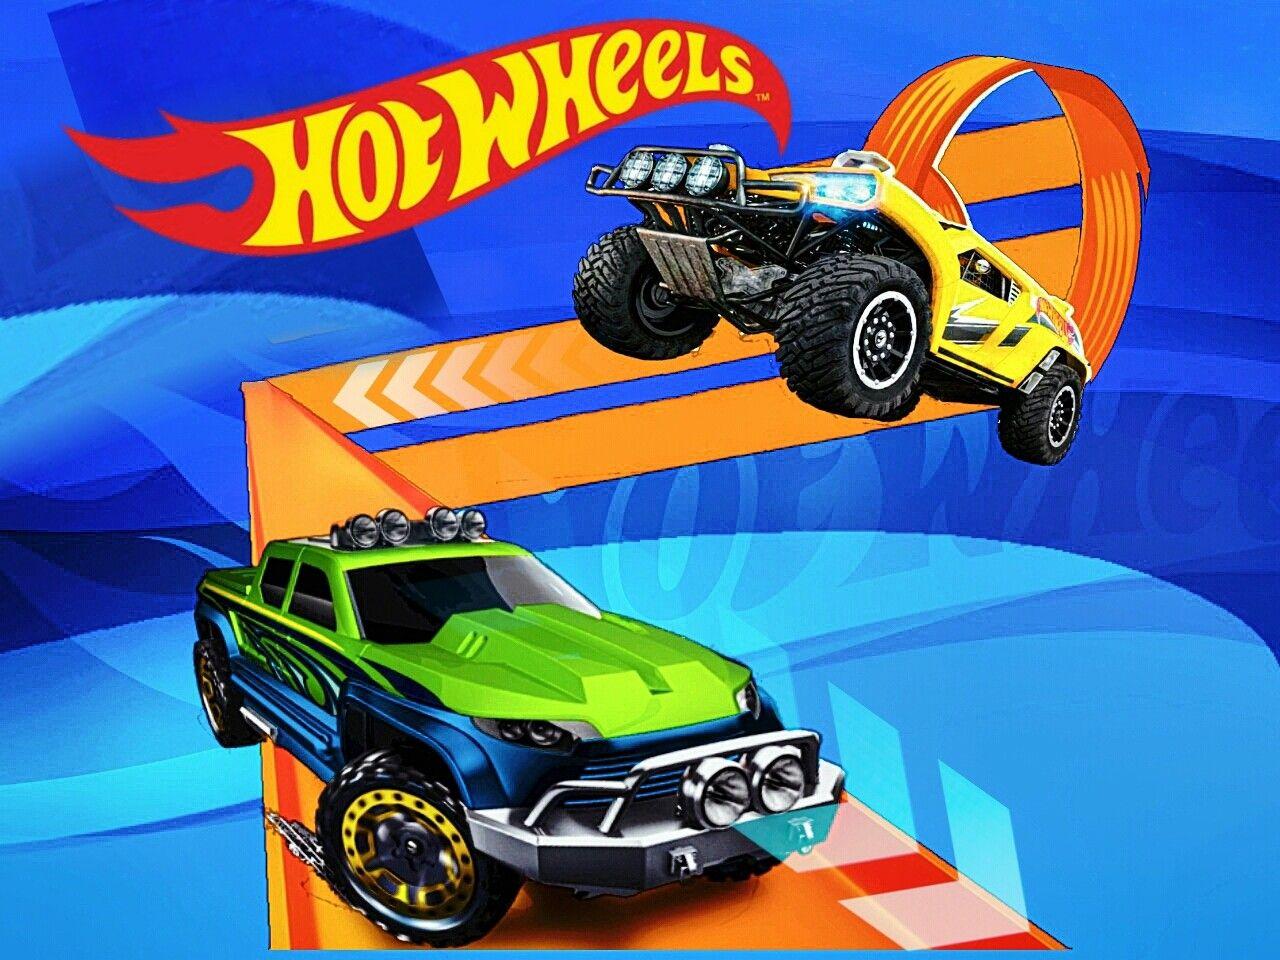 Hot Wheels Image Free Download Aniversario Hot Wheels Festa Hot Wheels Bolo Hot Wheels